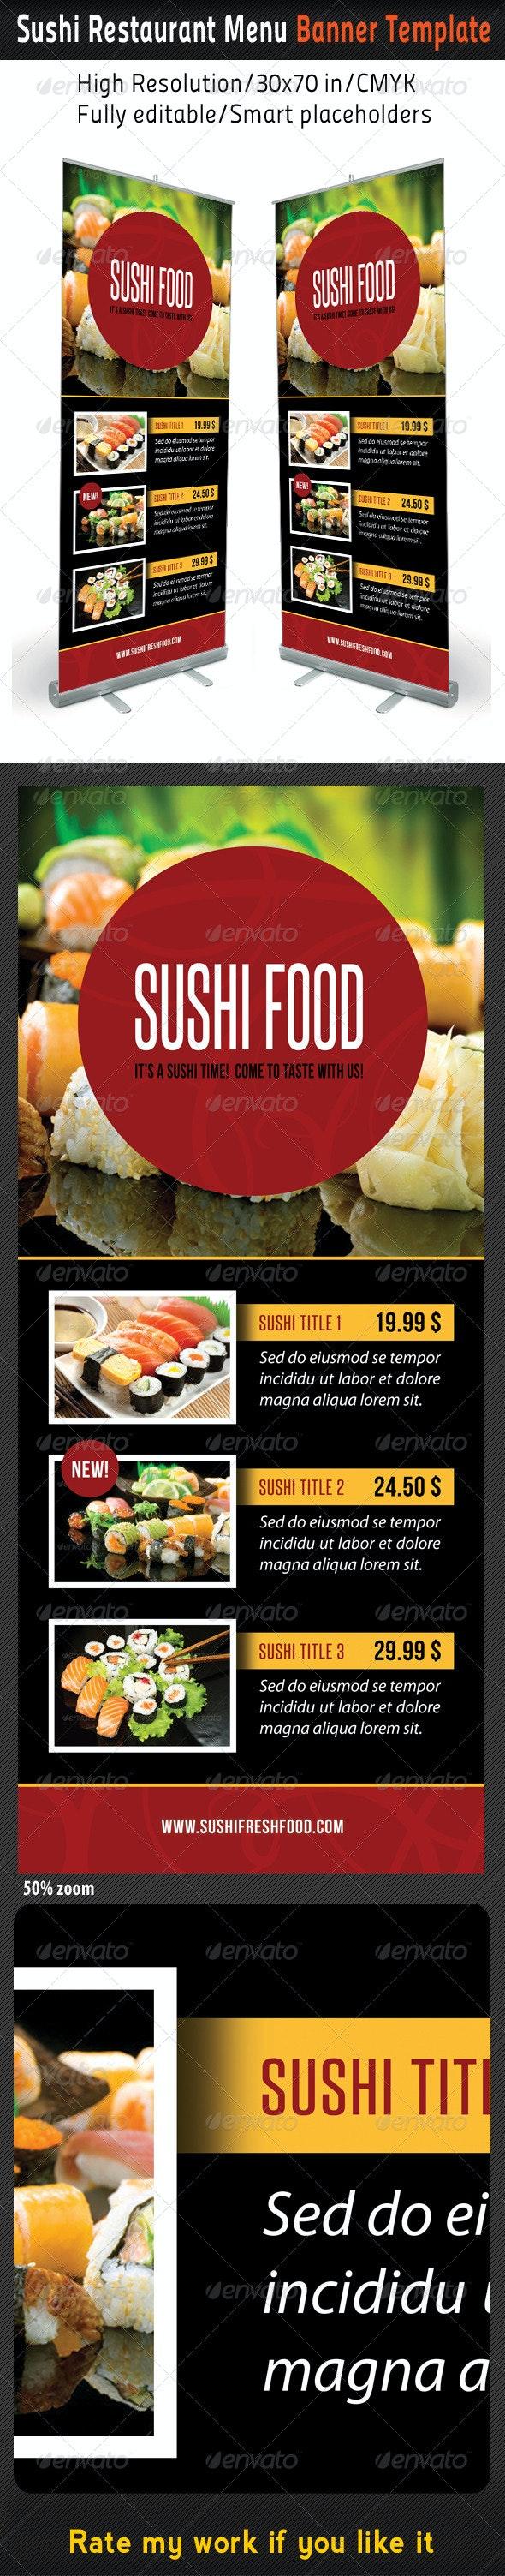 Sushi Restaurant Menu Banner Template 02 - Signage Print Templates